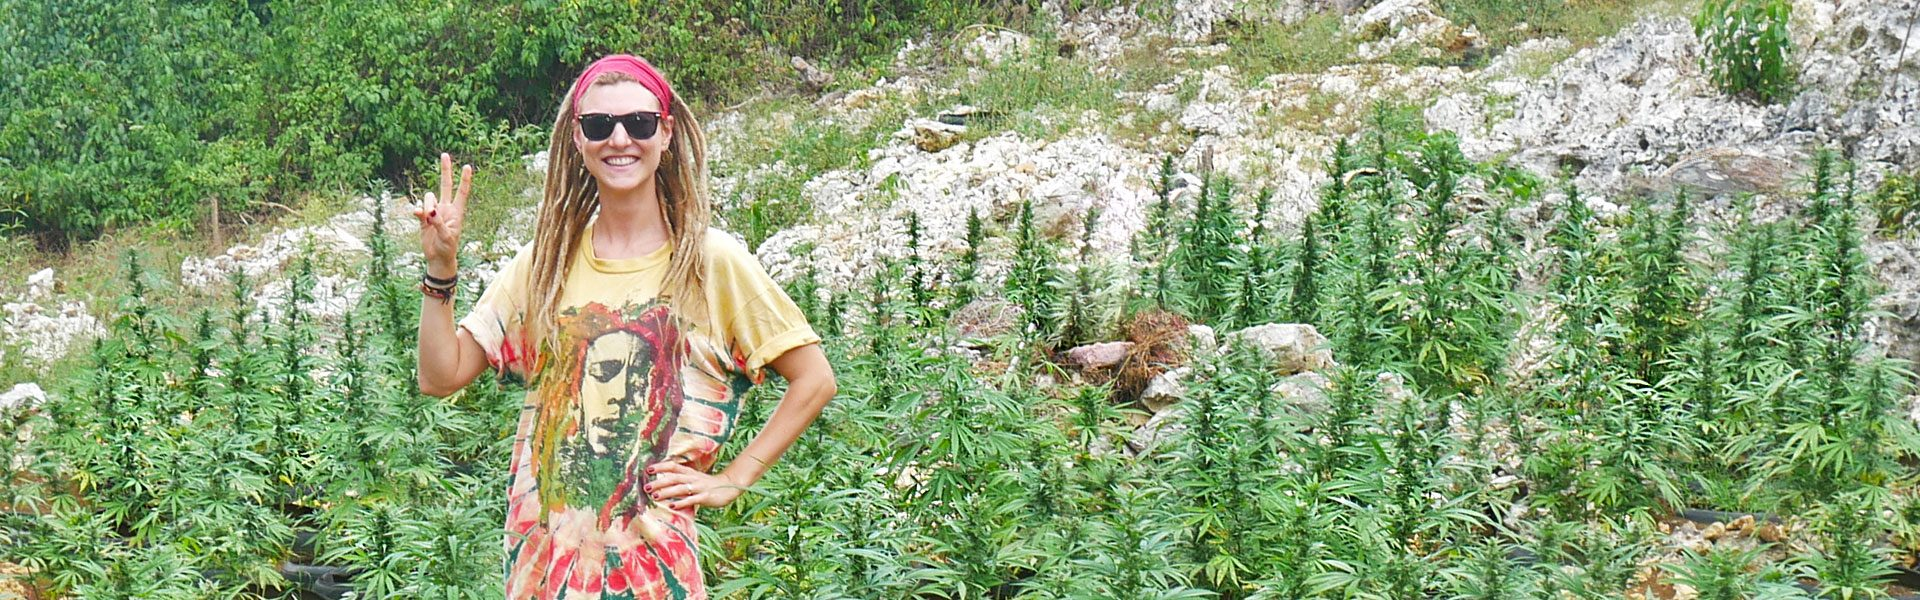 Rasta girl at weed farm near Negril, Jamaica